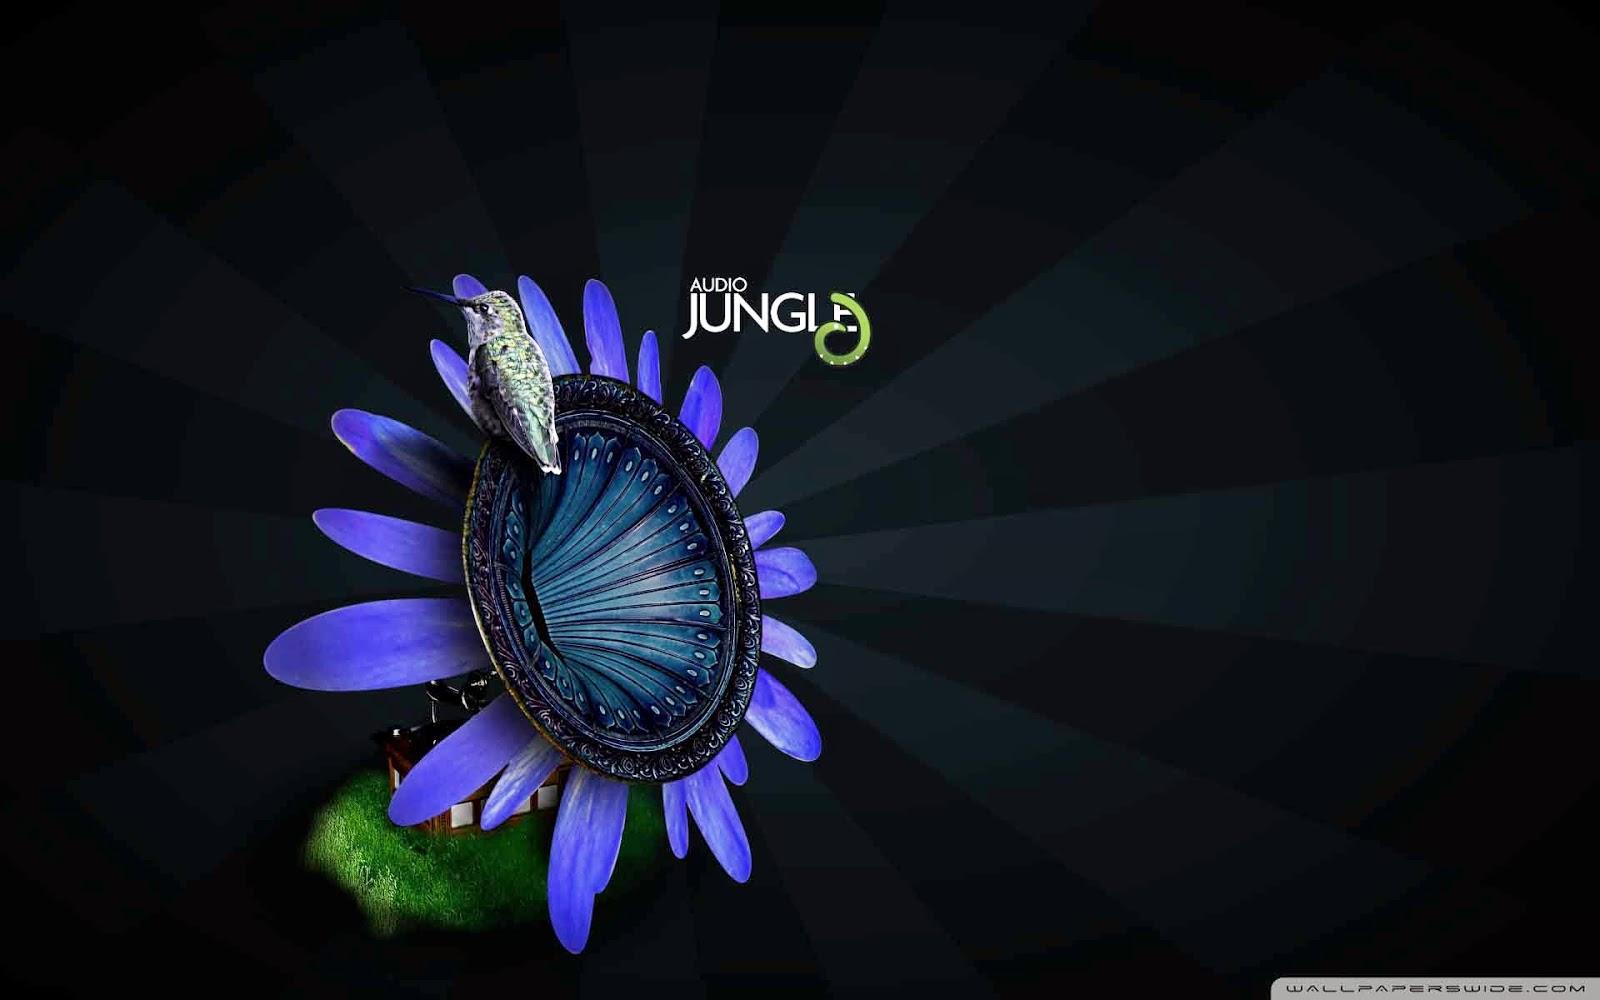 bird on flower gramophone audio jungle wallpaper